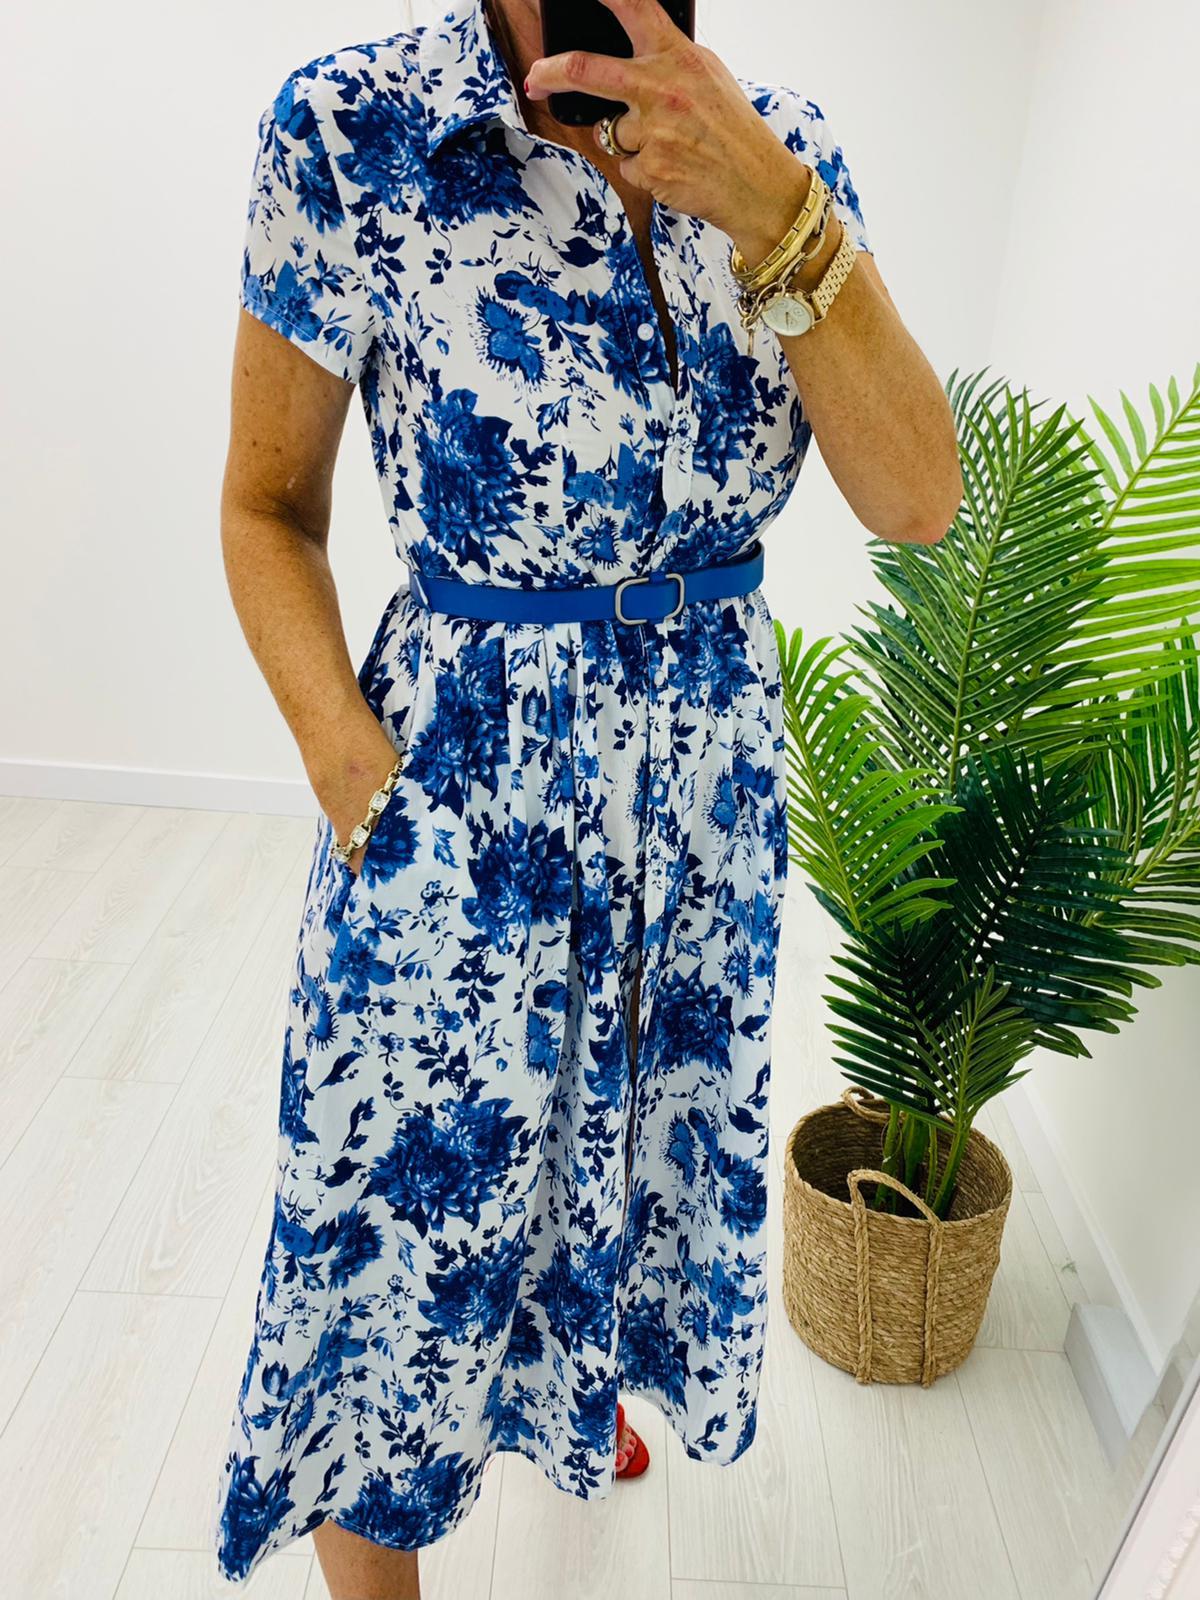 White/Blue Floral Dress